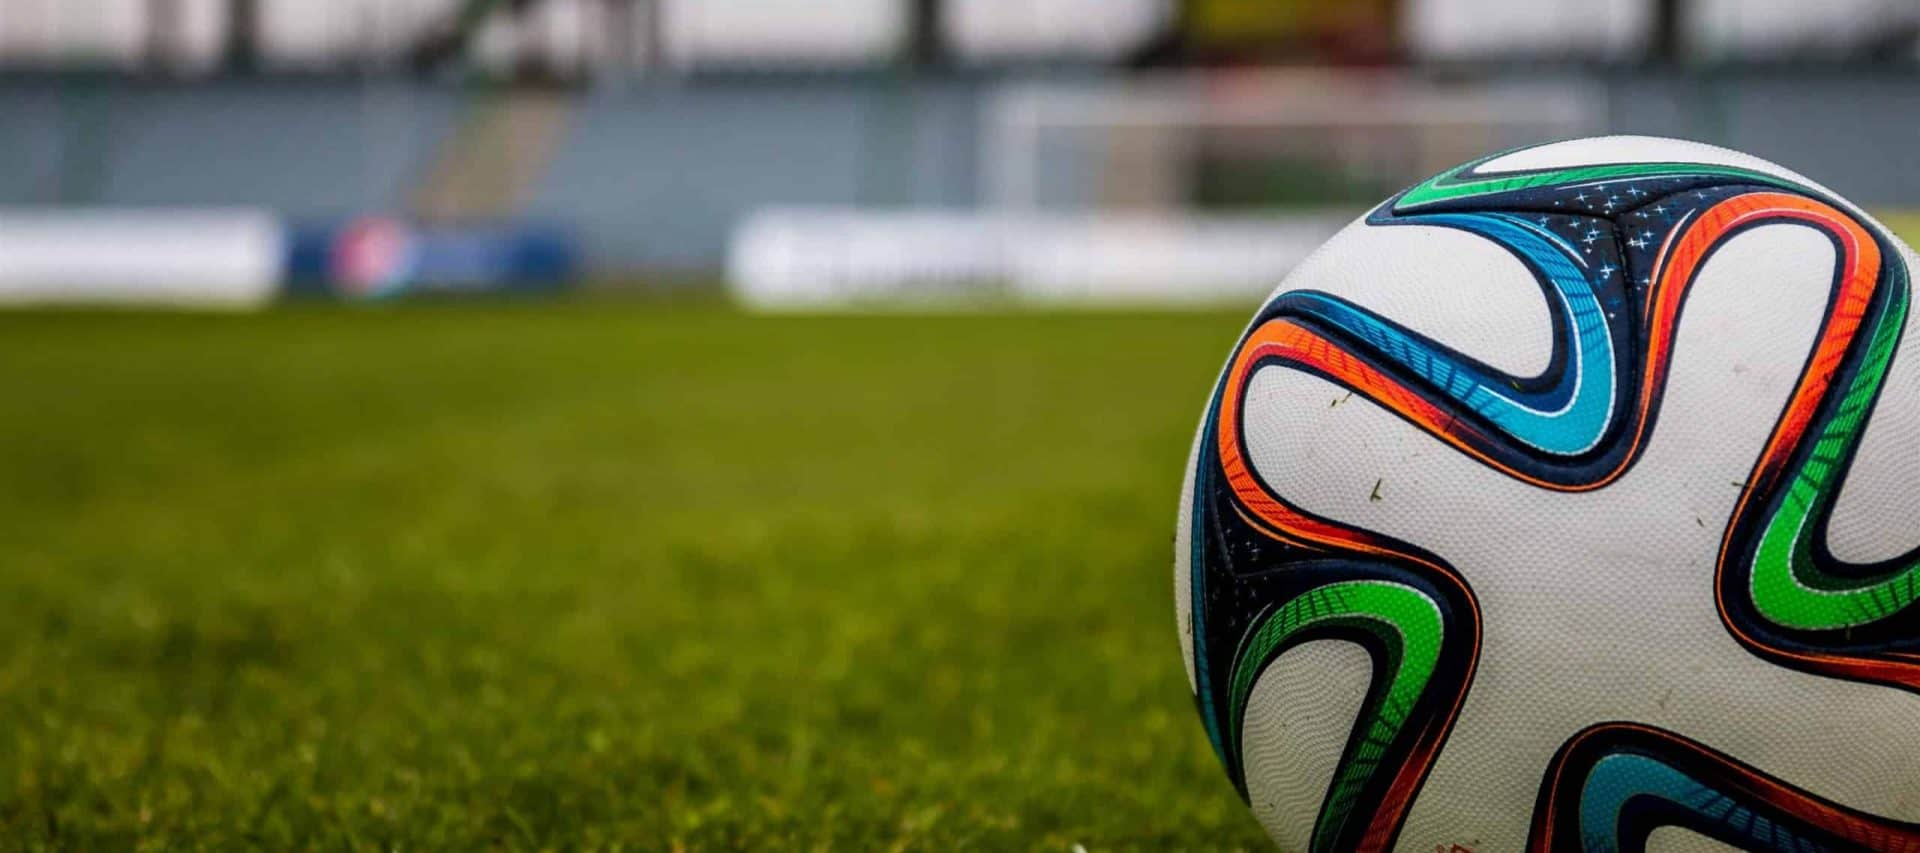 Futbol and Artificial Turf